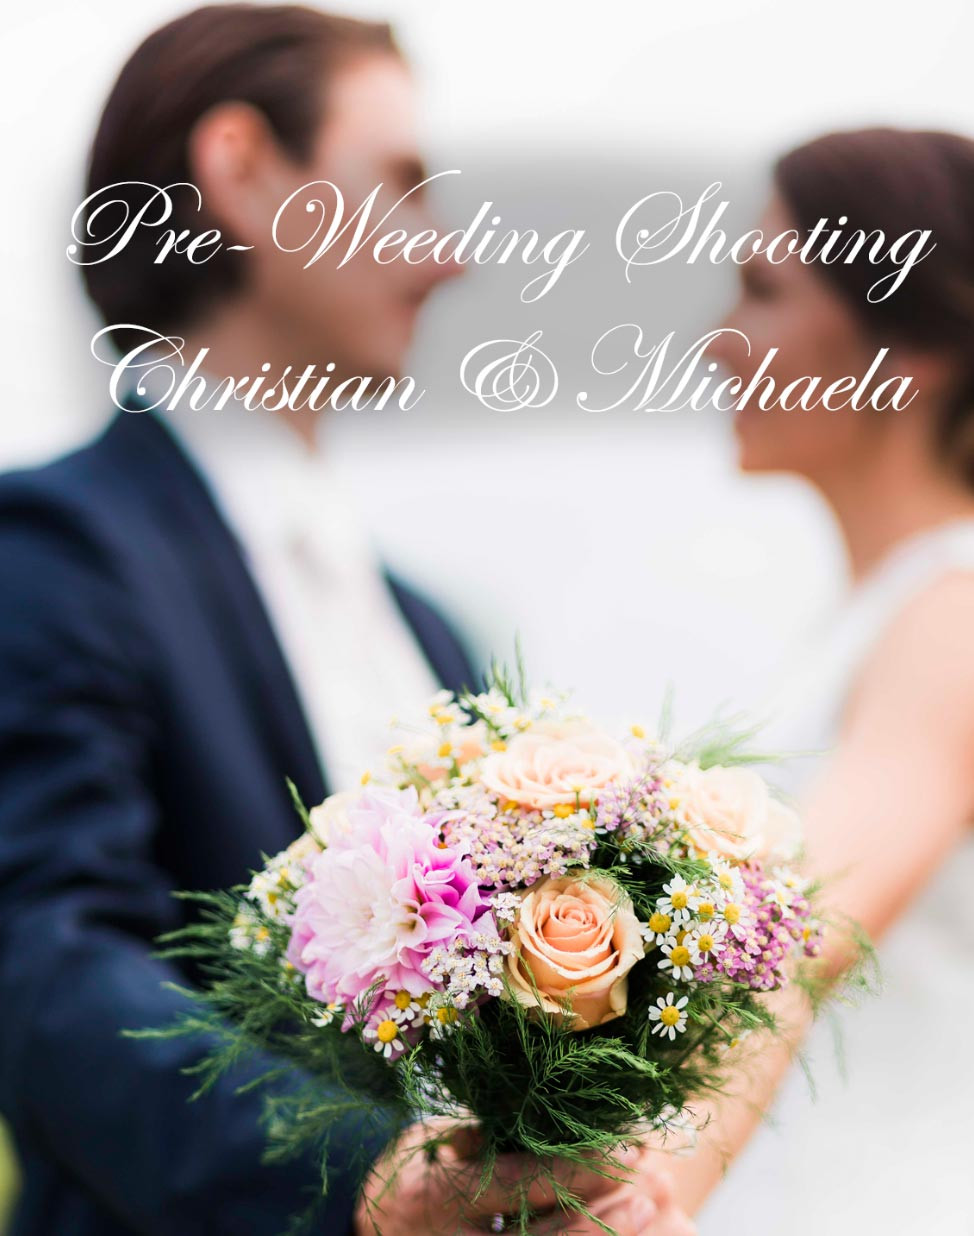 Pre Wedding Shooting